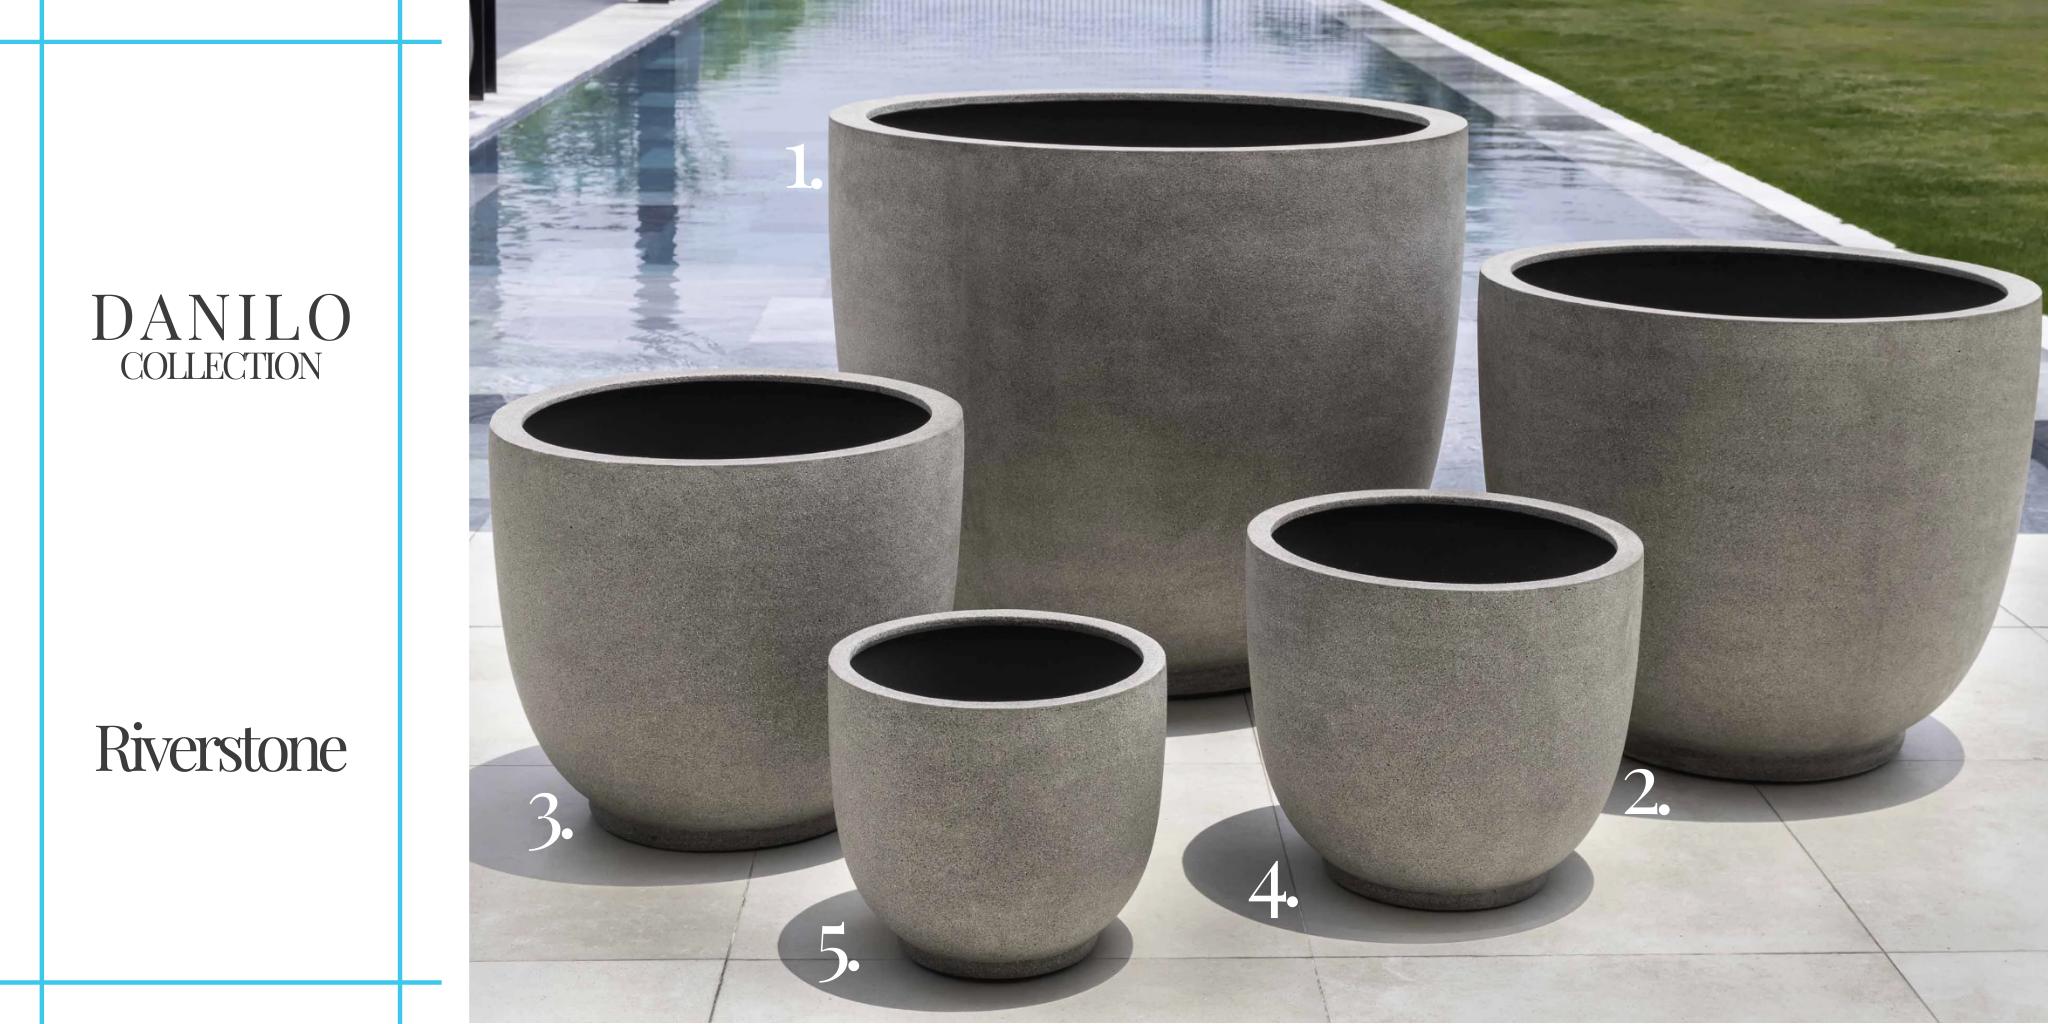 danilo-collection-riverstone planter set by Campania